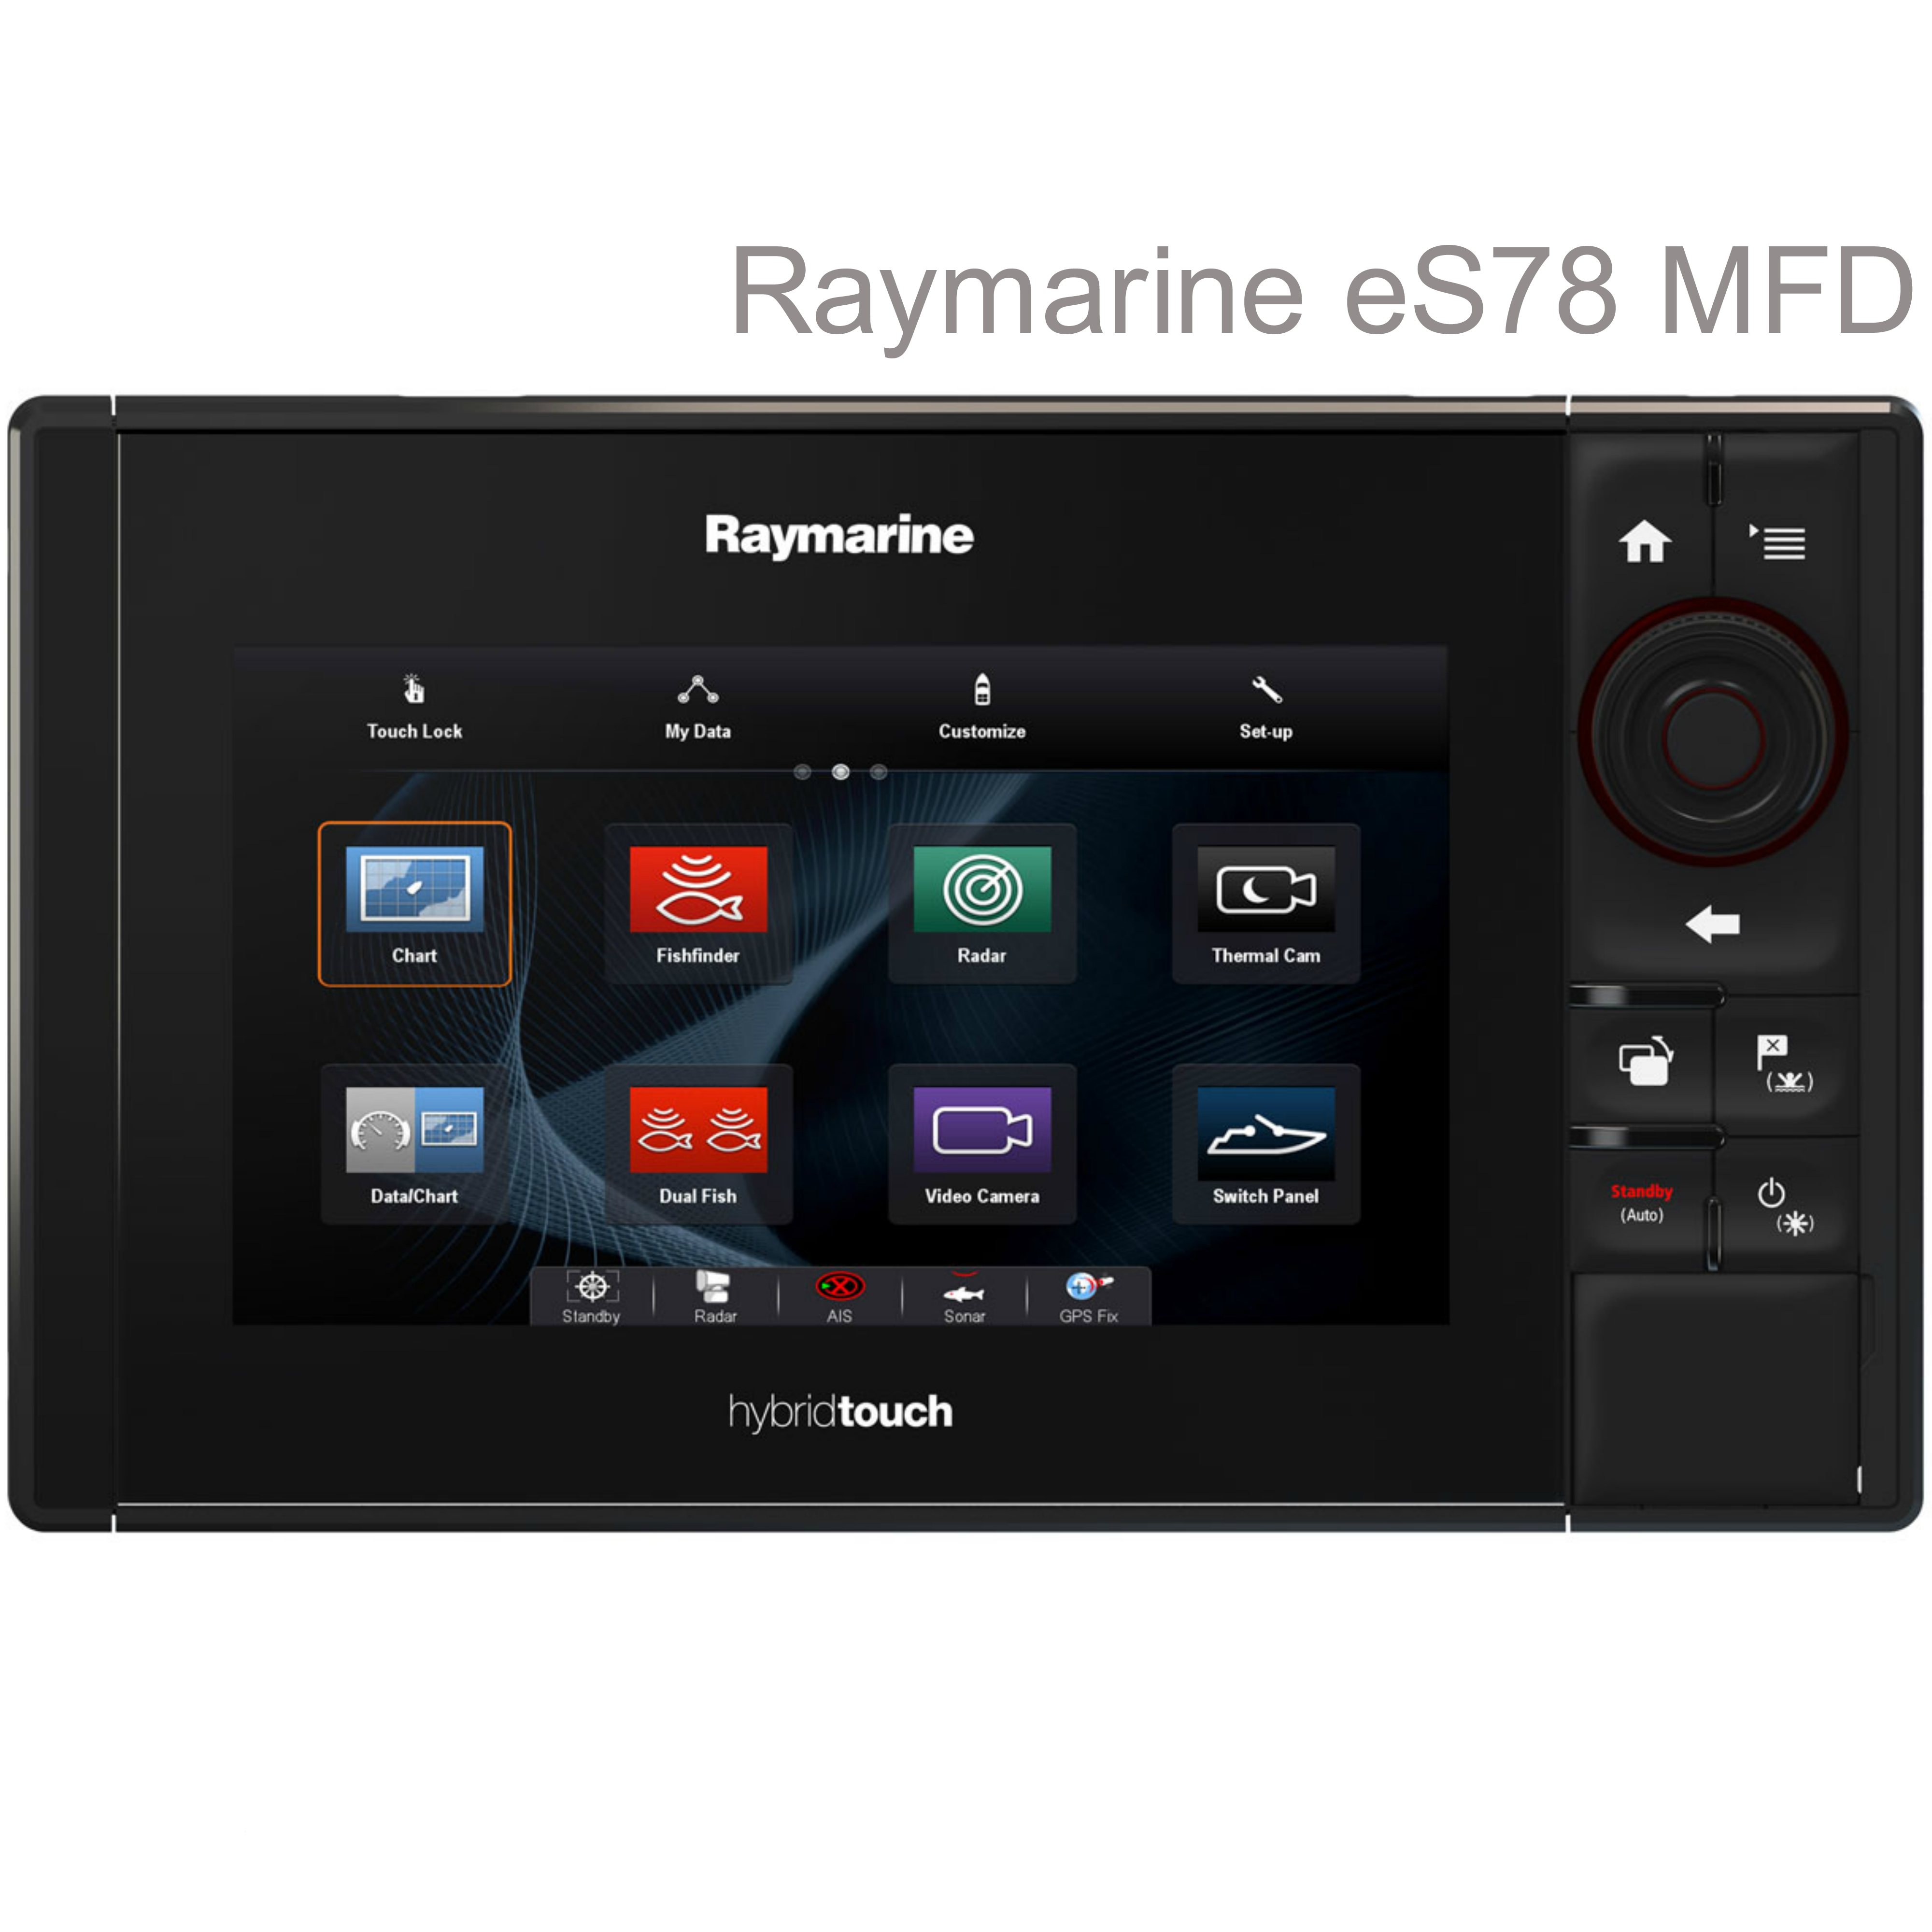 "Raymarine E70265|eS78 Hybrid Touch MFD-7""|CHIRP|Sonar|DownVIsion|Wi-Fi/BT|IPX6/IPX7|For Marine"